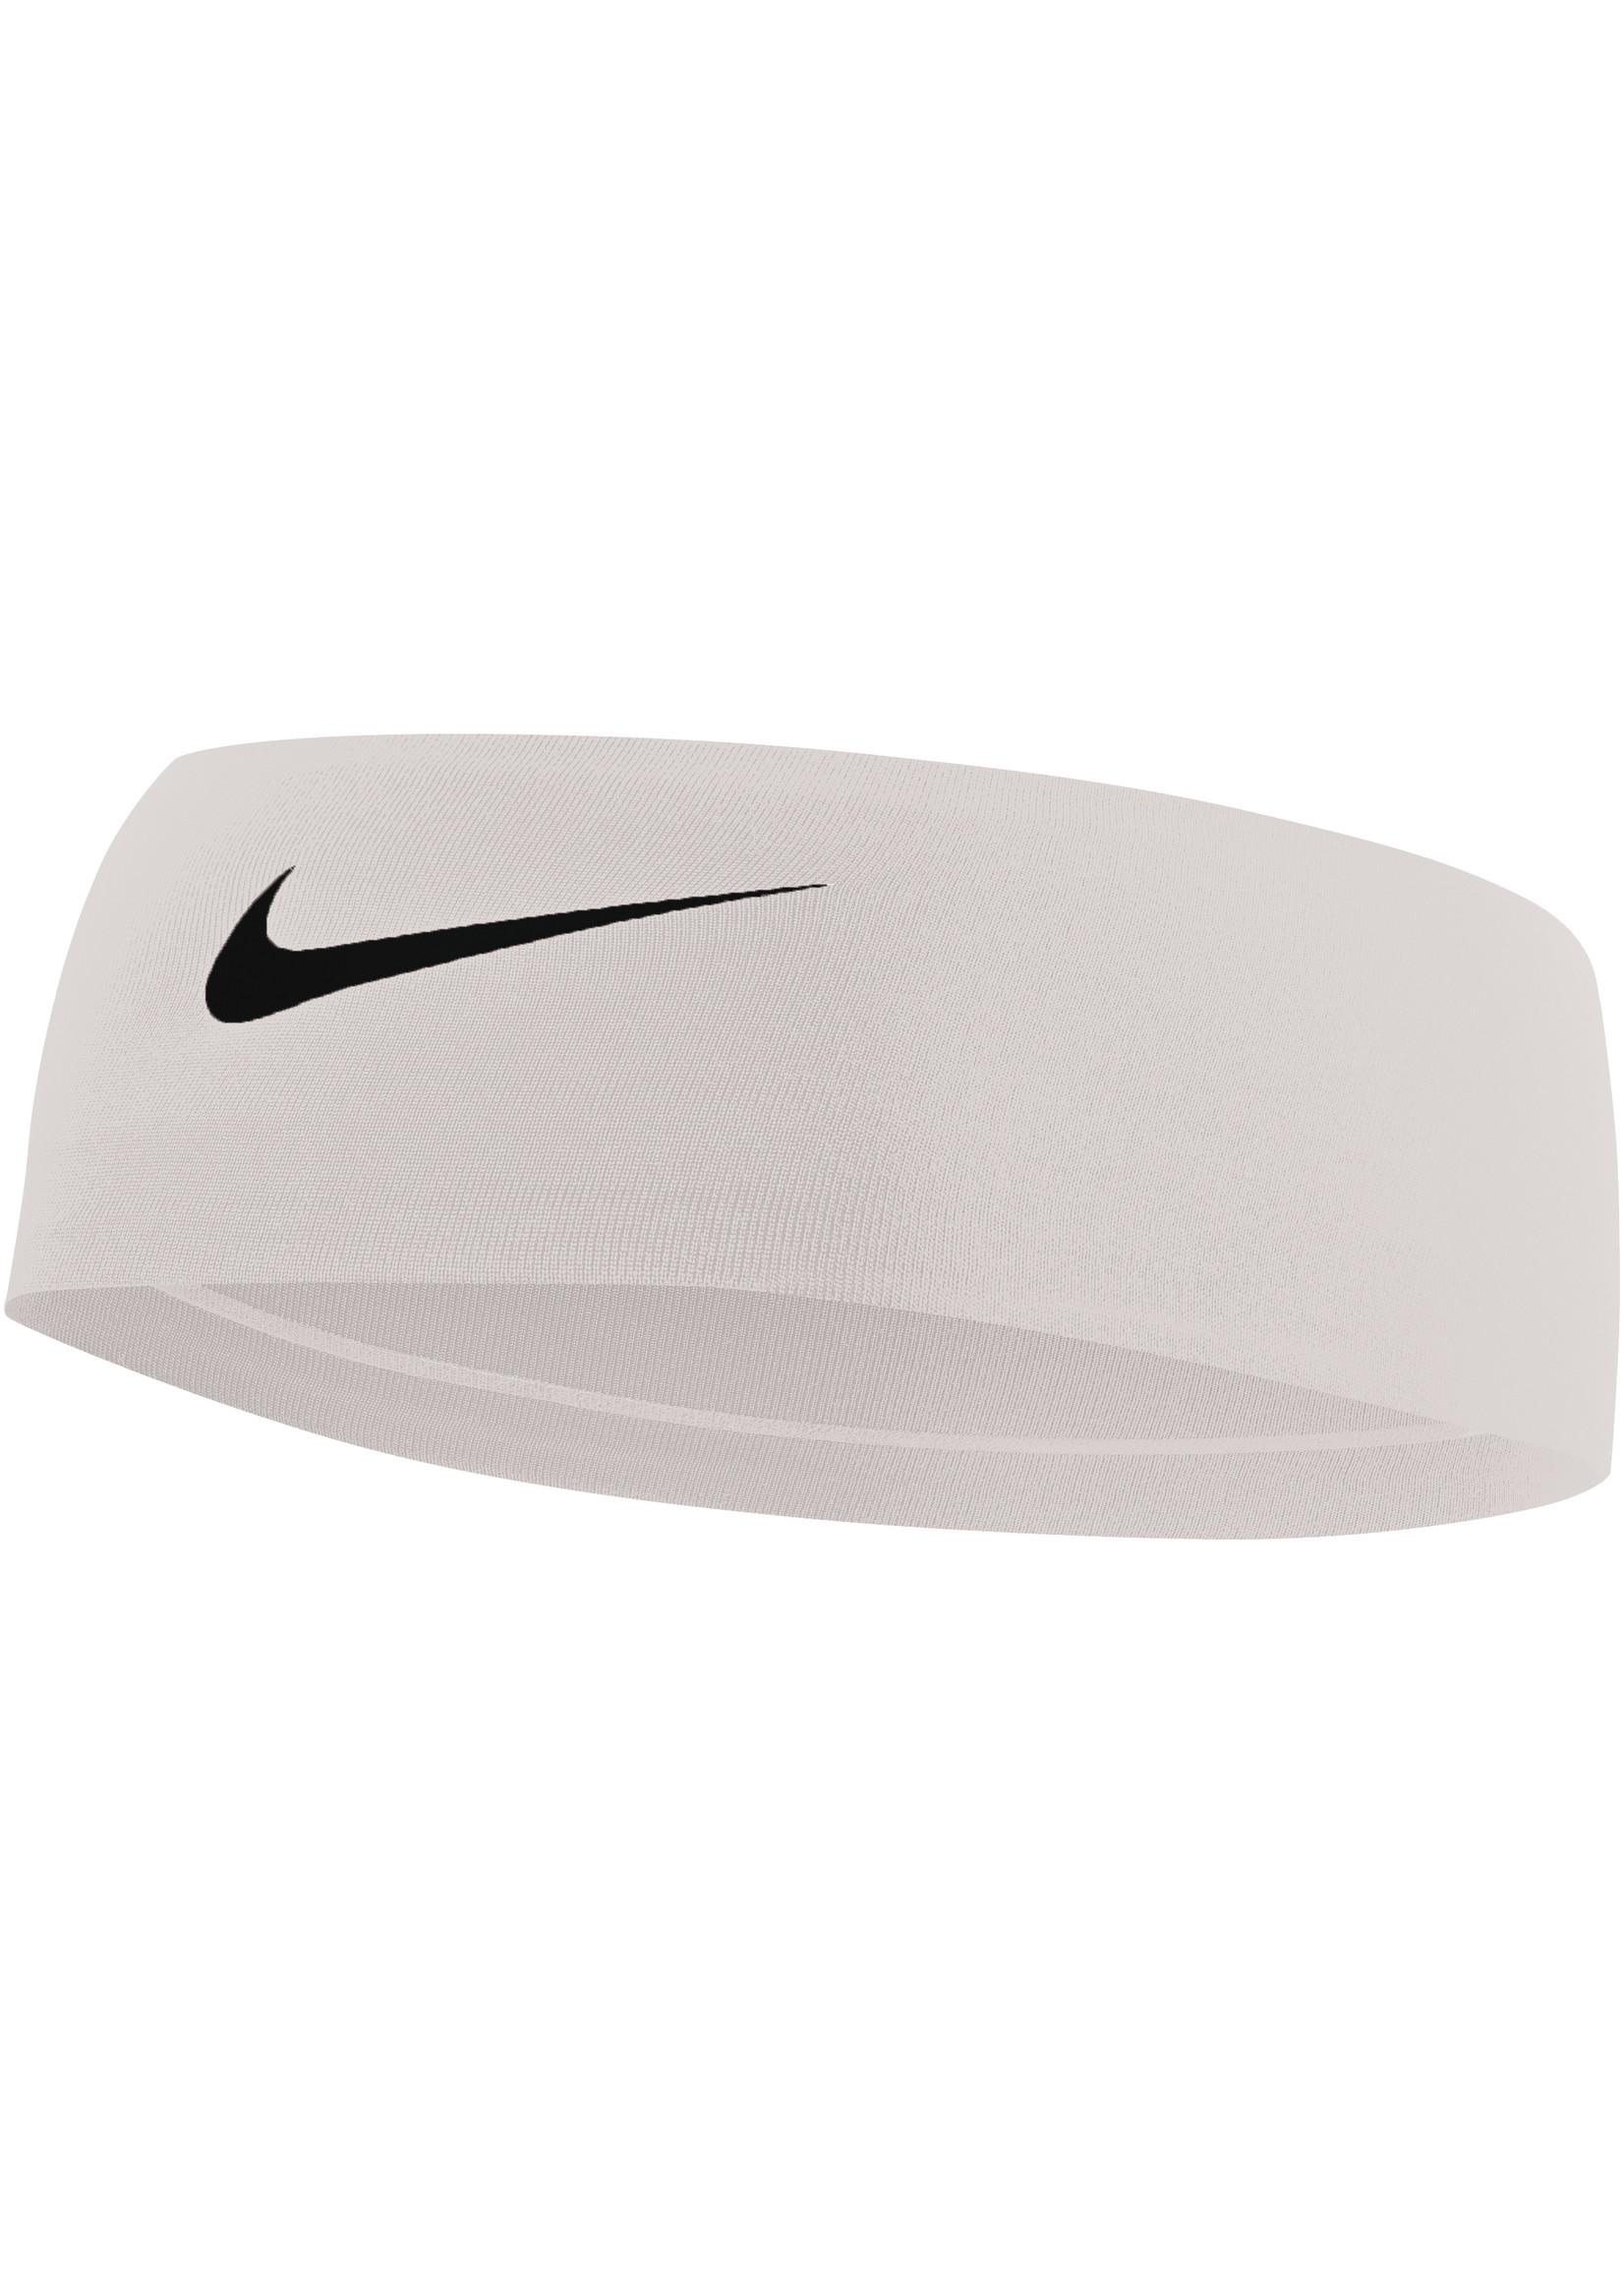 Nike Fury Headband 2.0 White/ Black Youth